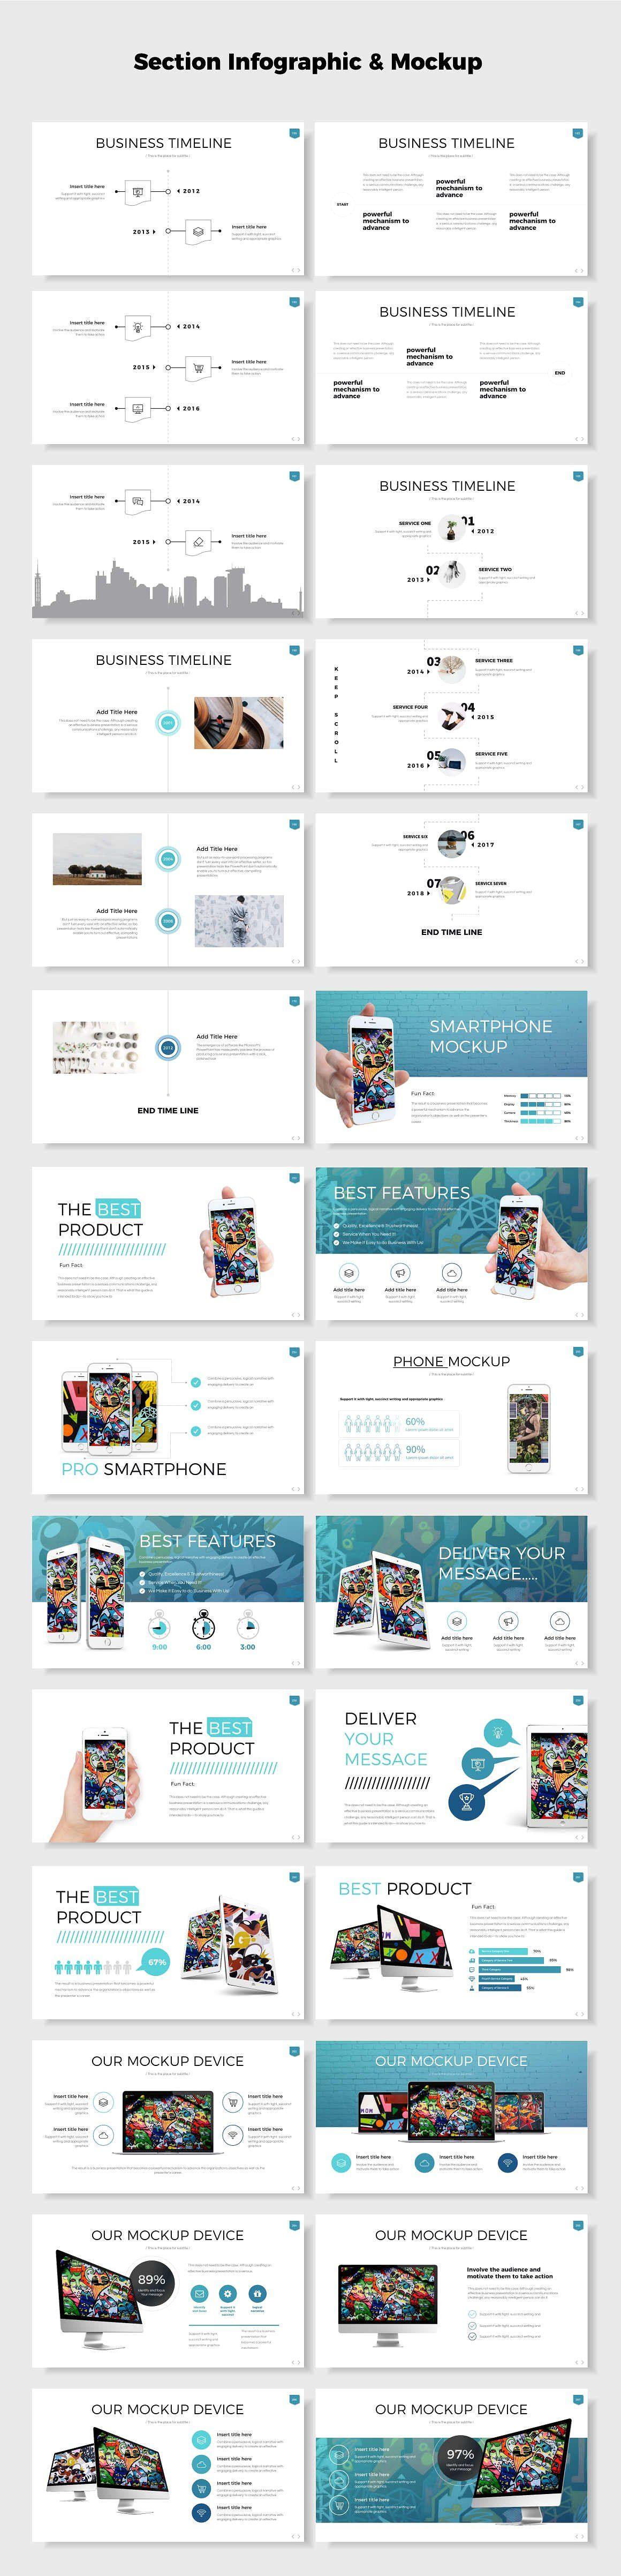 Gante powerpoint template presentation templates template and gante powerpoint template by mikoslide on creativemarket toneelgroepblik Choice Image